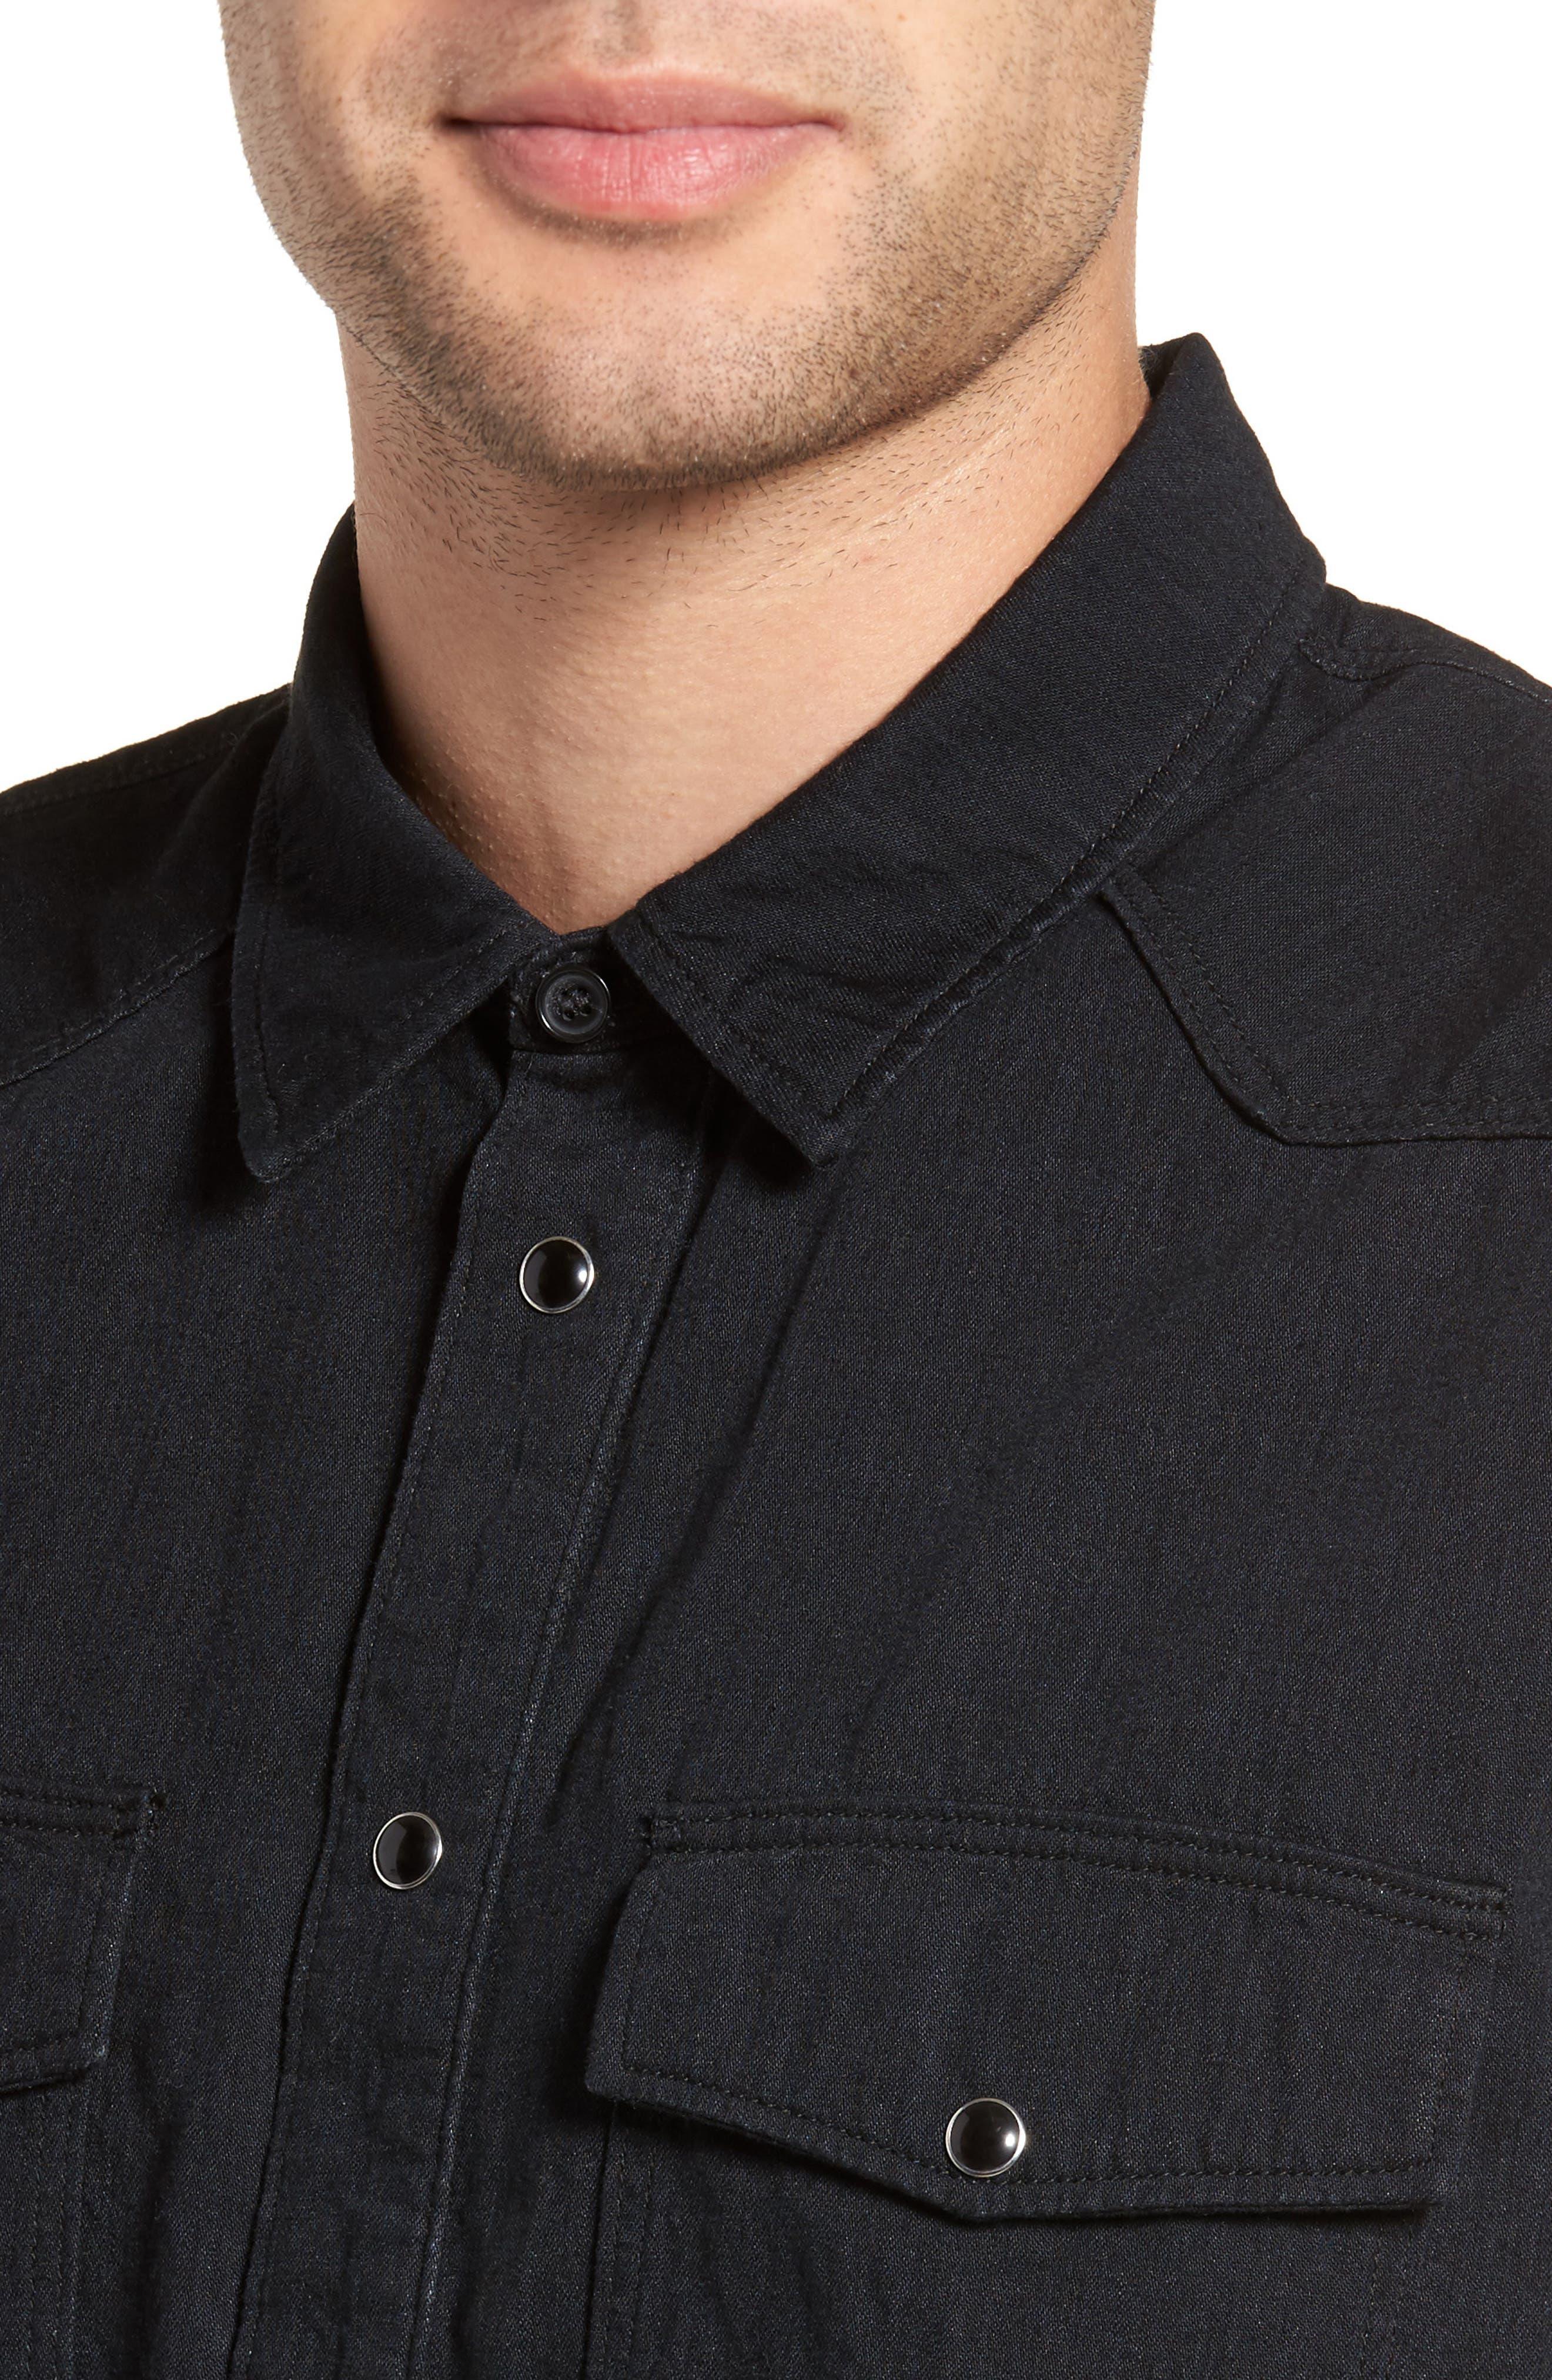 Western Chambray Sport Shirt,                             Alternate thumbnail 4, color,                             001